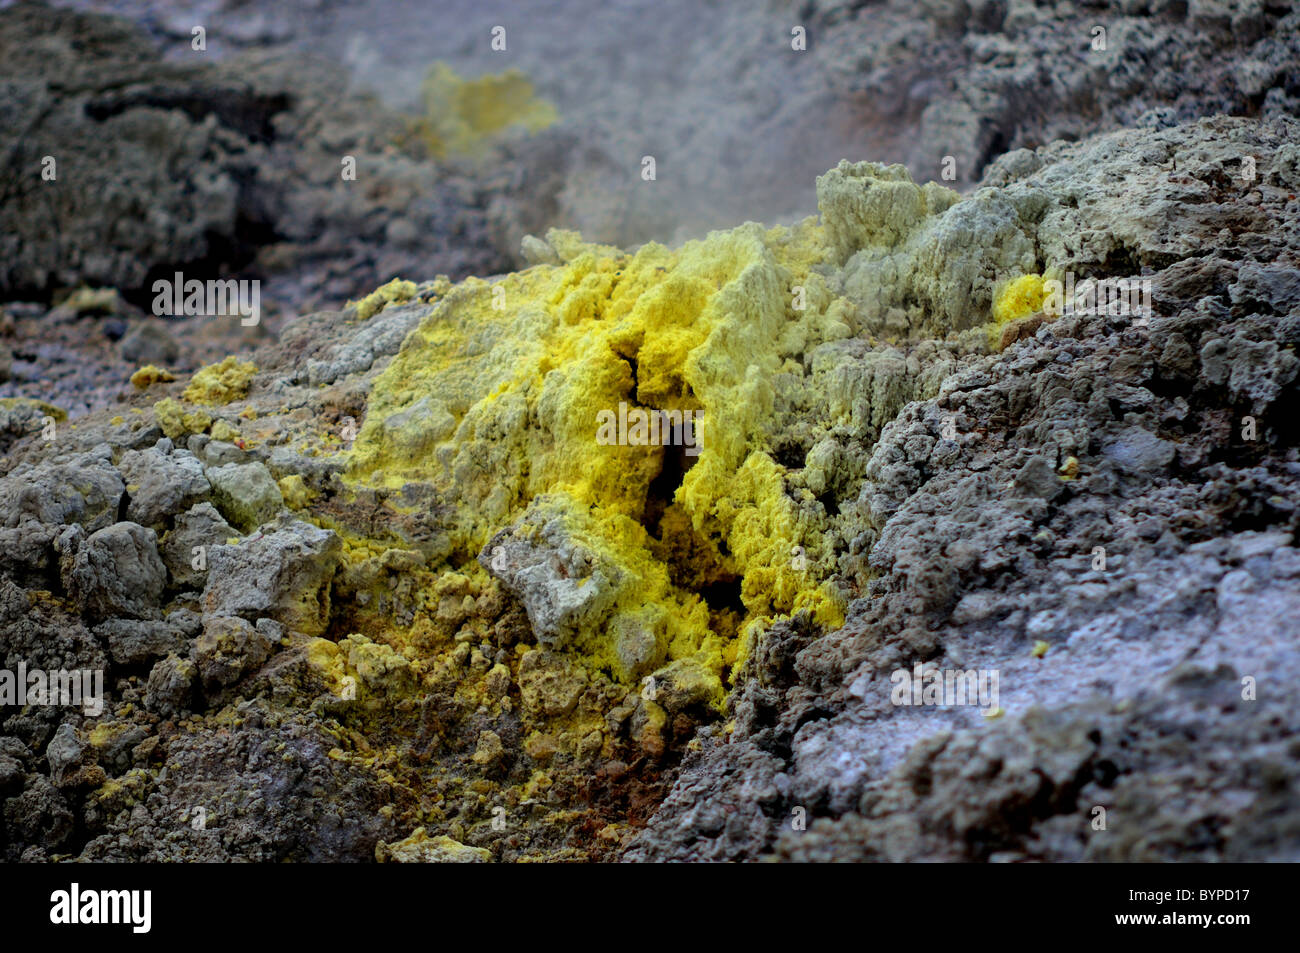 Deposits of elemental sulphur around vents in Wai-o-tapu geothermal region in New Zealand - Stock Image